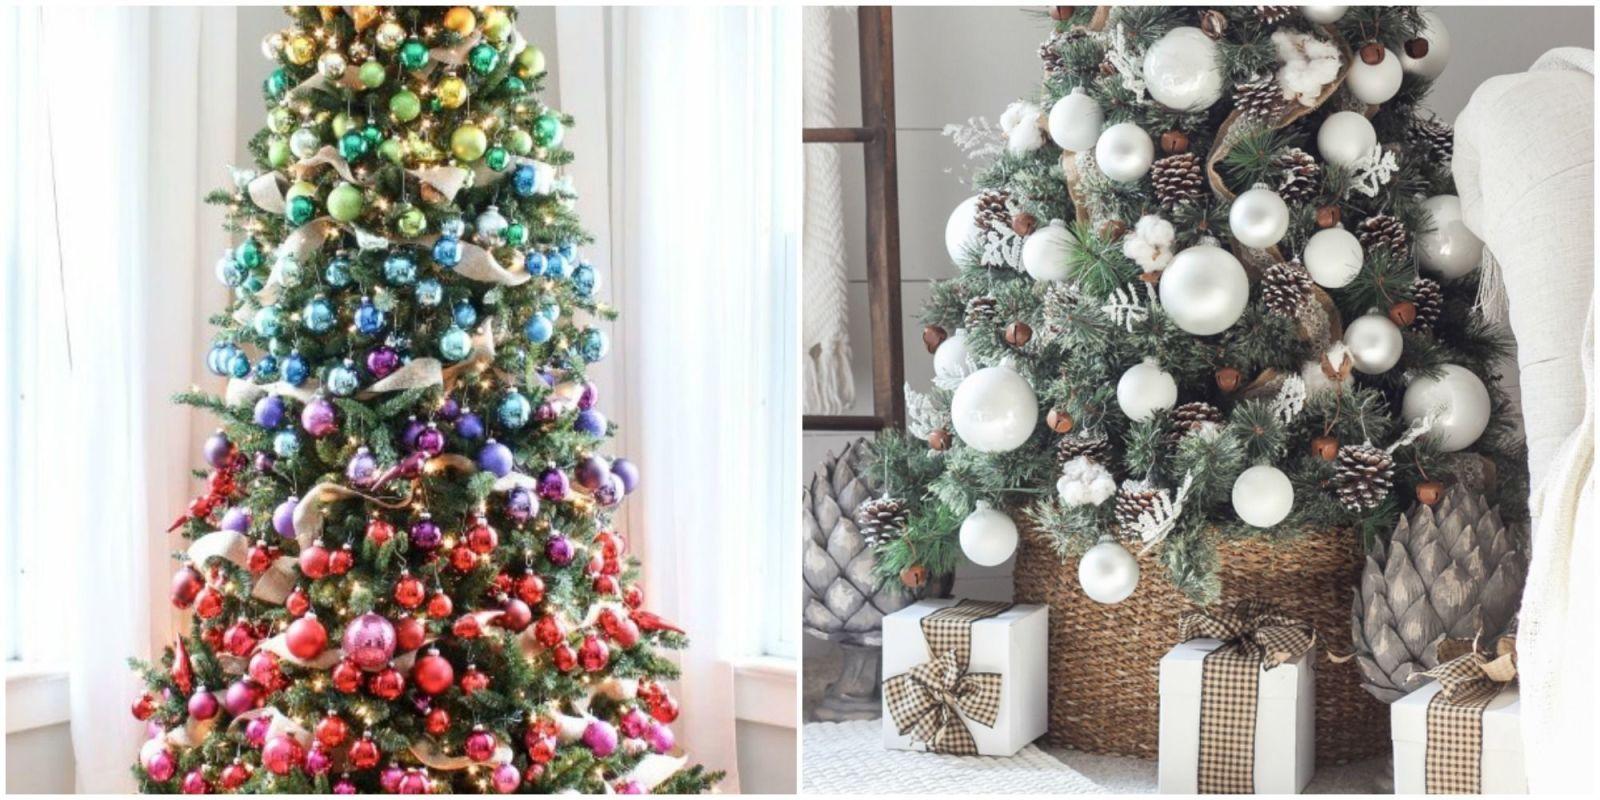 21 unique christmas tree decorations - 2016 ideas for decorating